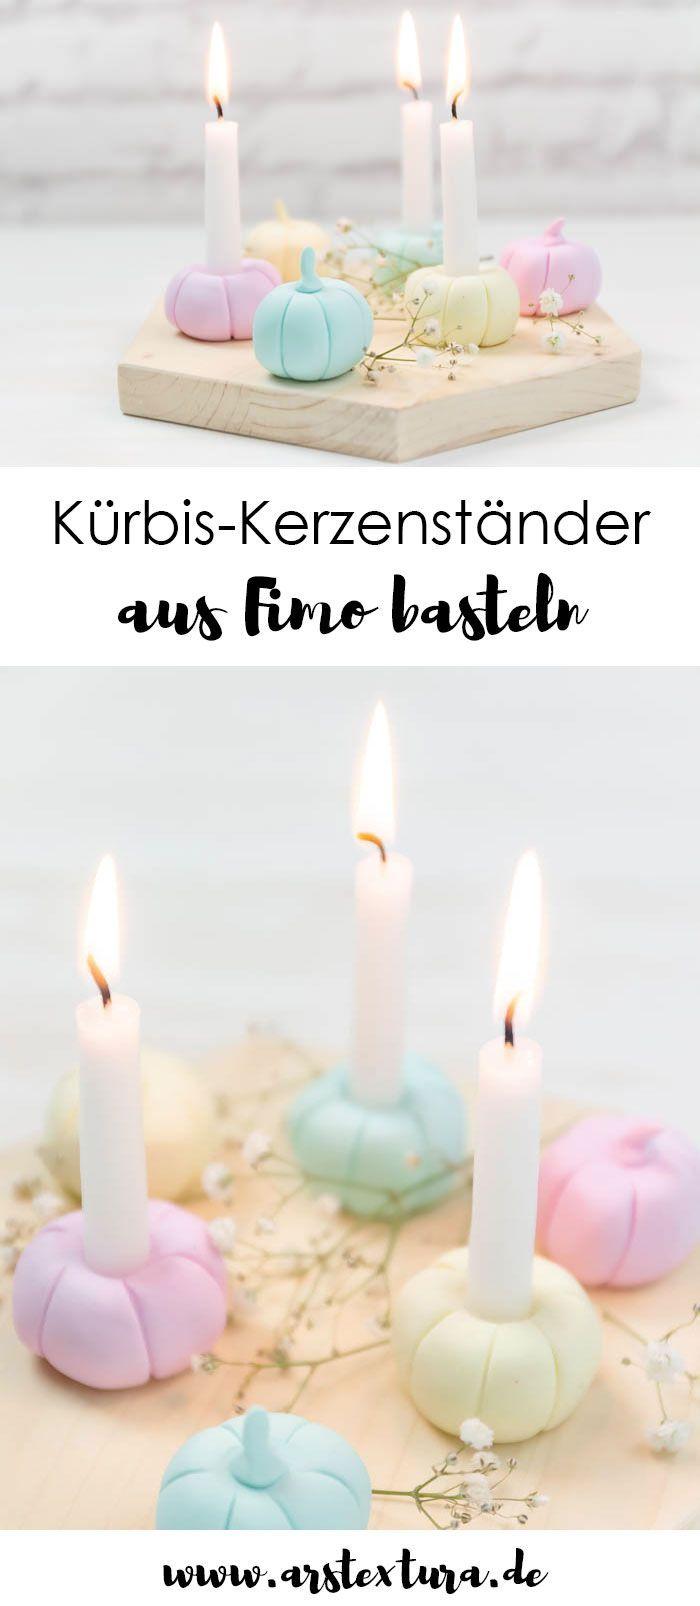 Kurbis Kerzenstander Aus Fimo Basteln